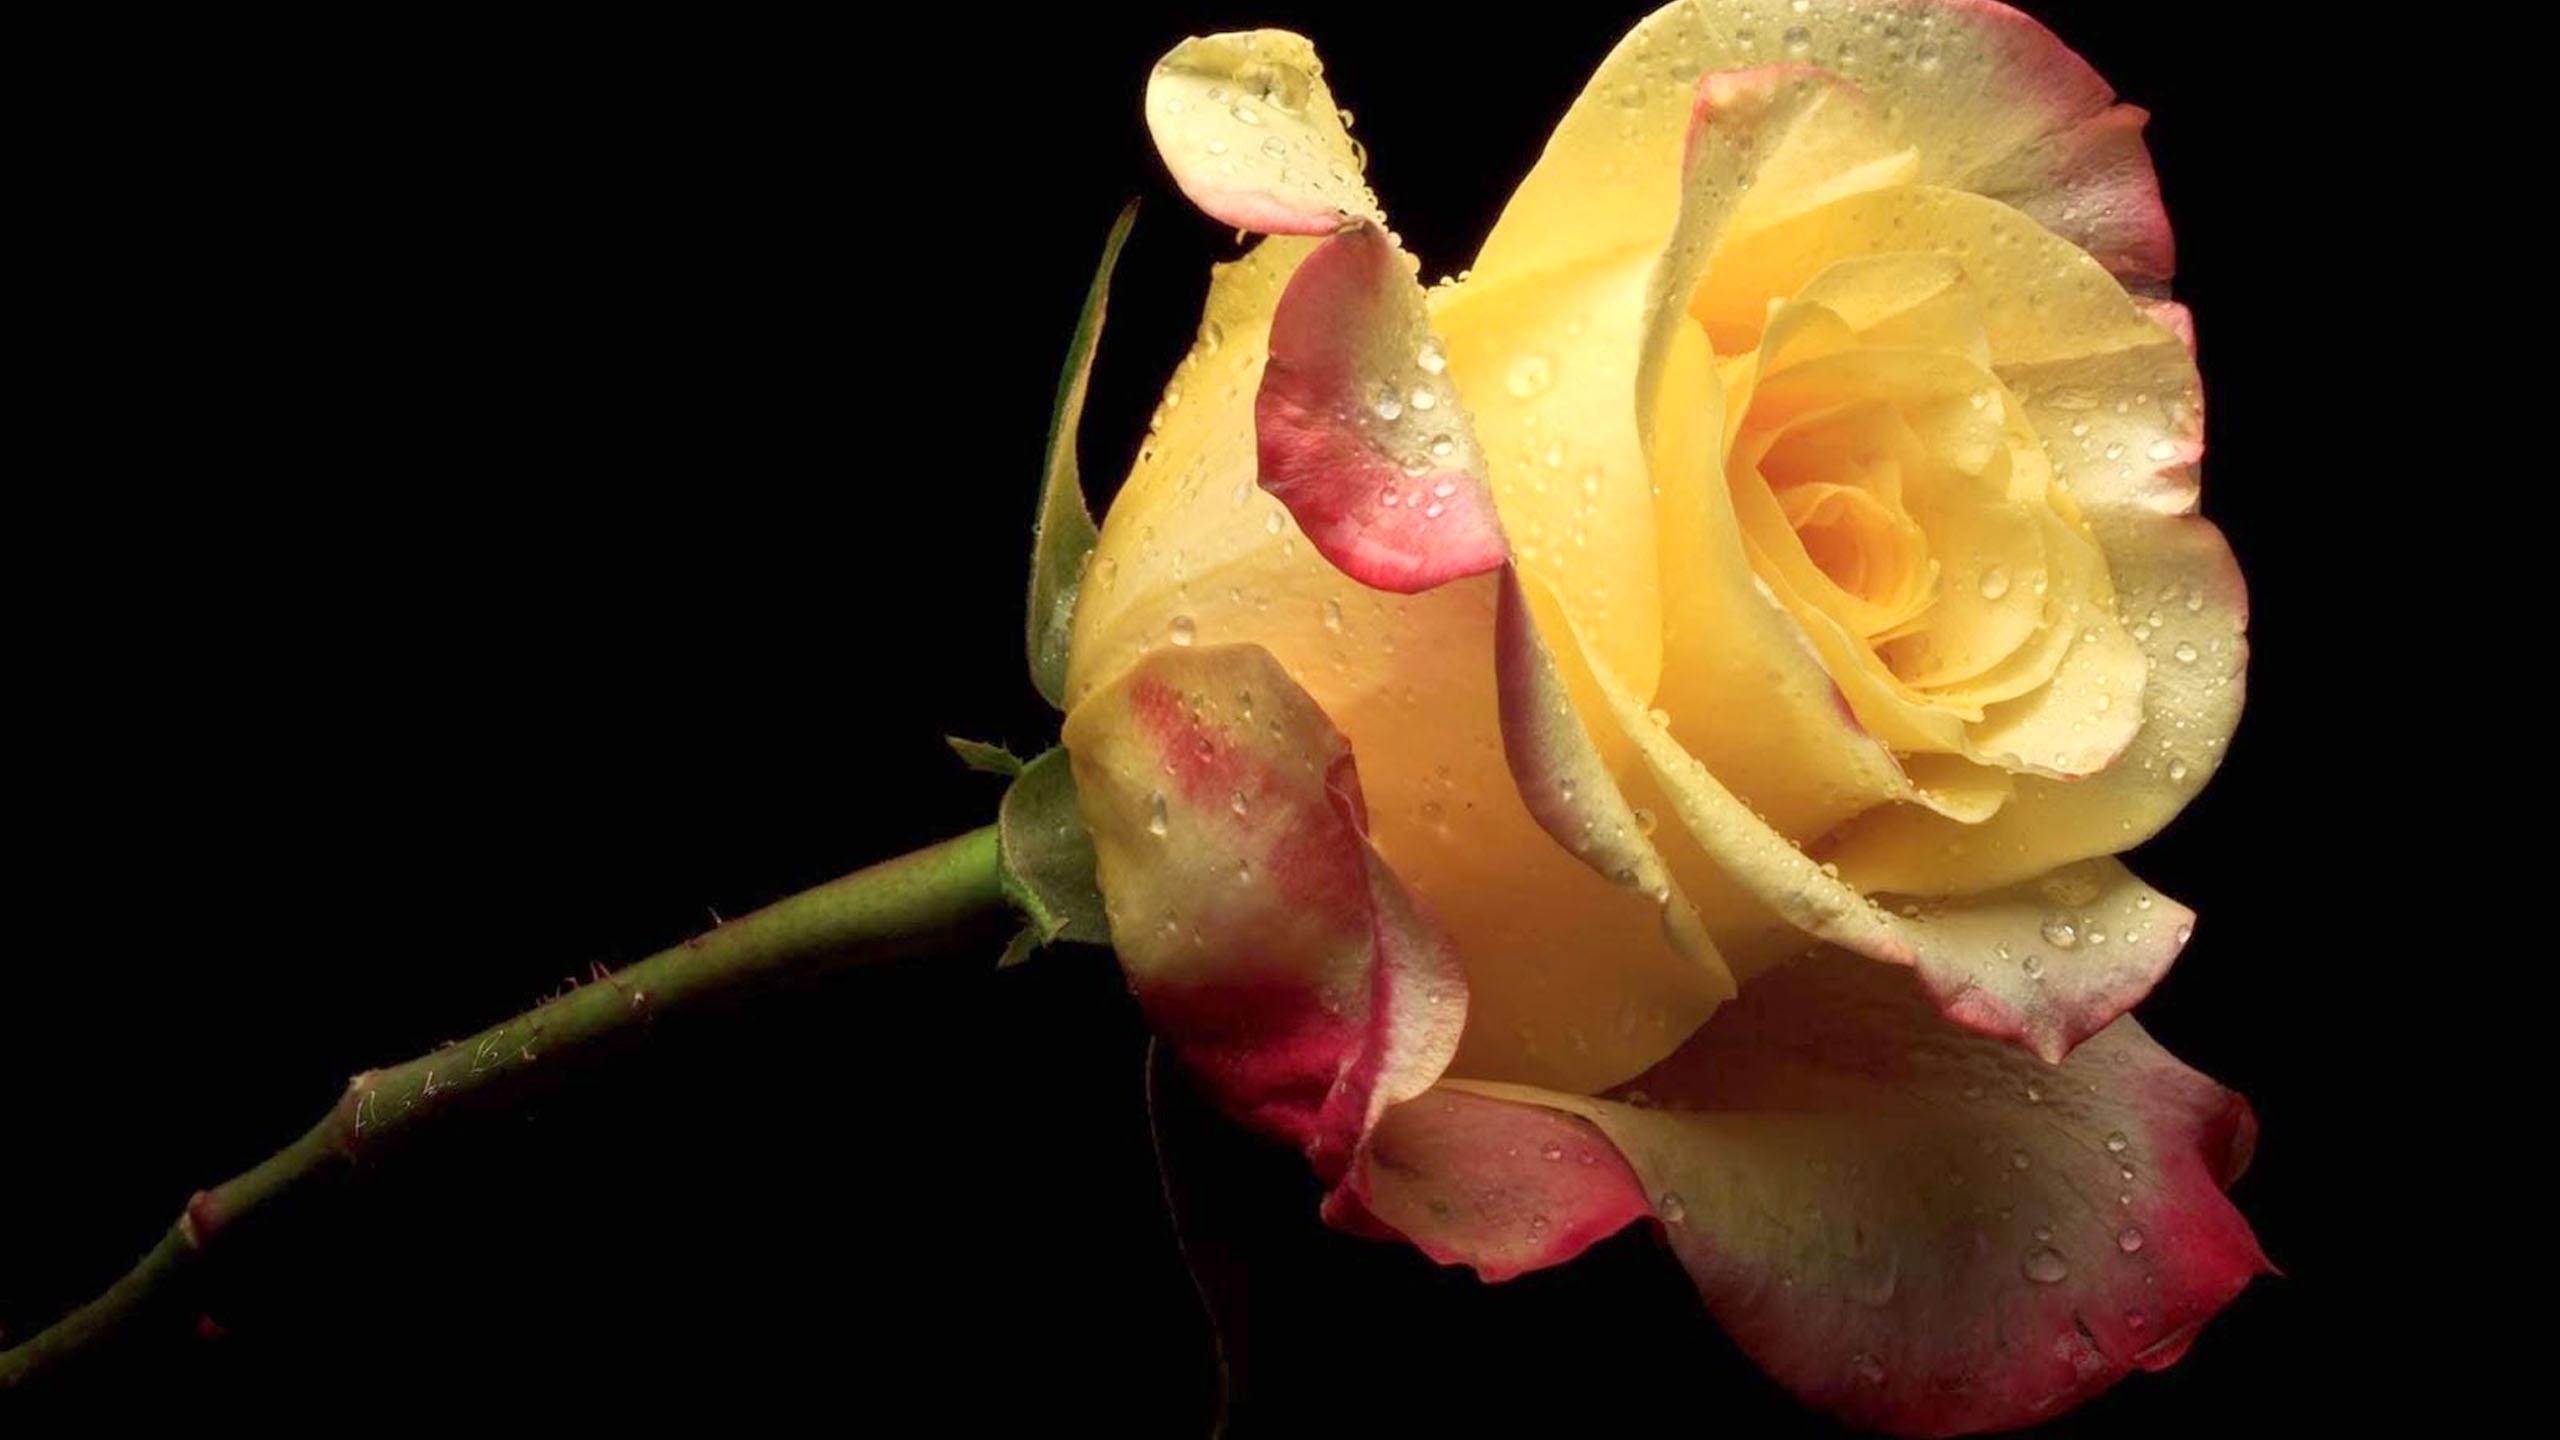 yellow-rose-http-1080-net-yellow-rose-html-wallpaper-wpc58010505